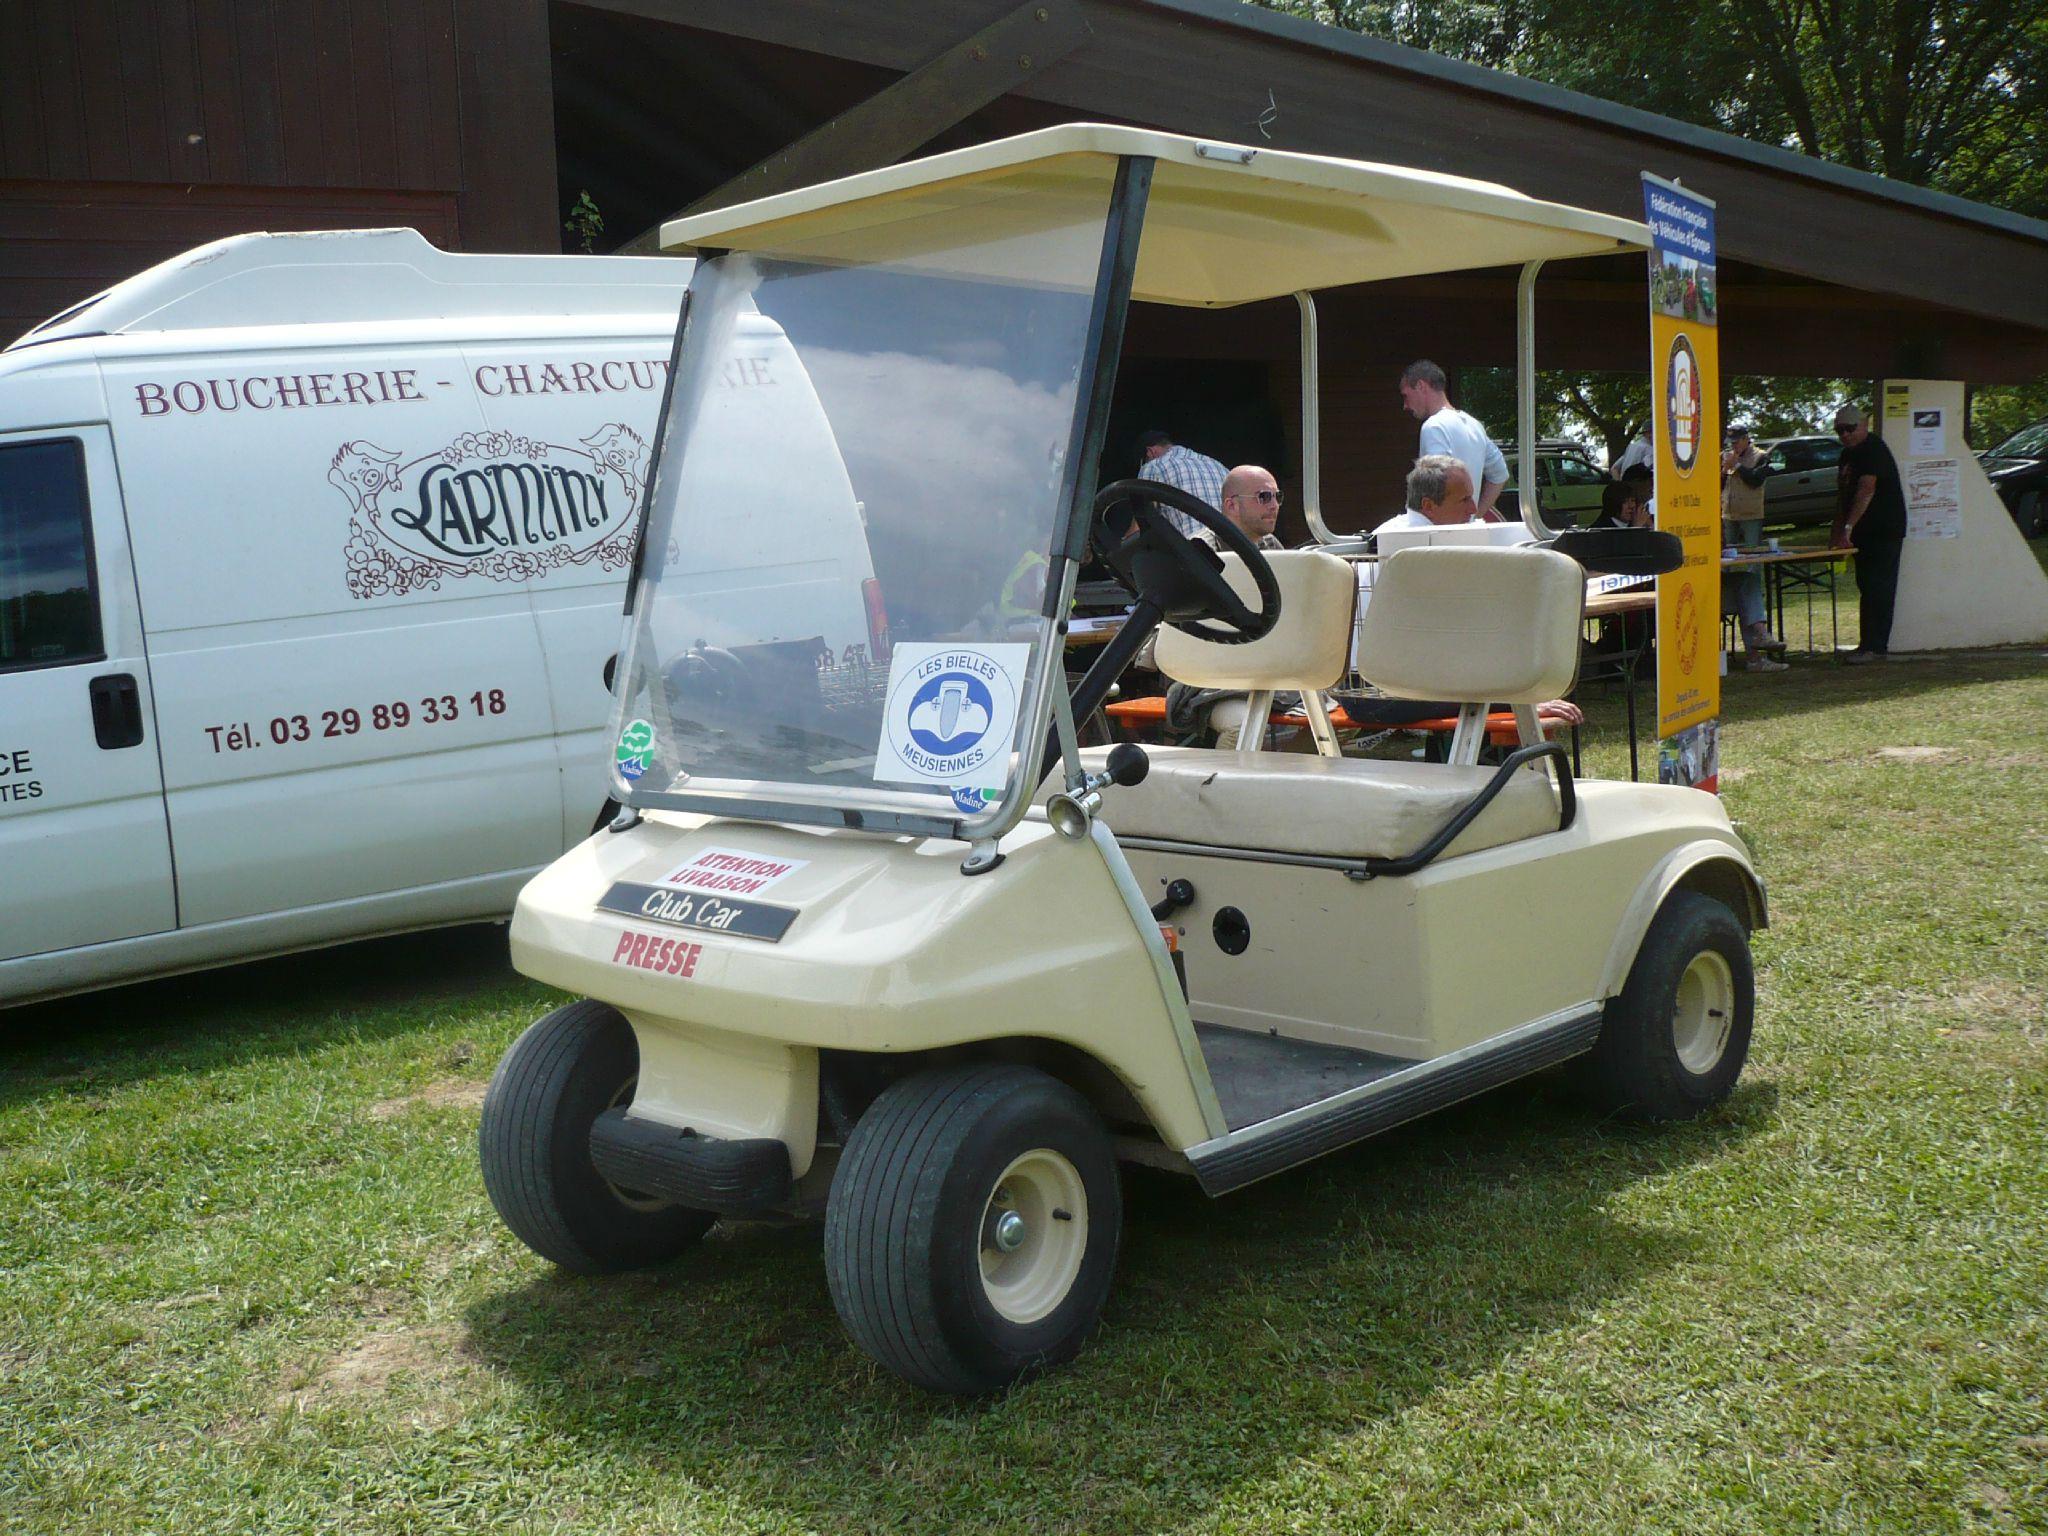 CLUB CAR DS Player voiturette de golf Madine (1)